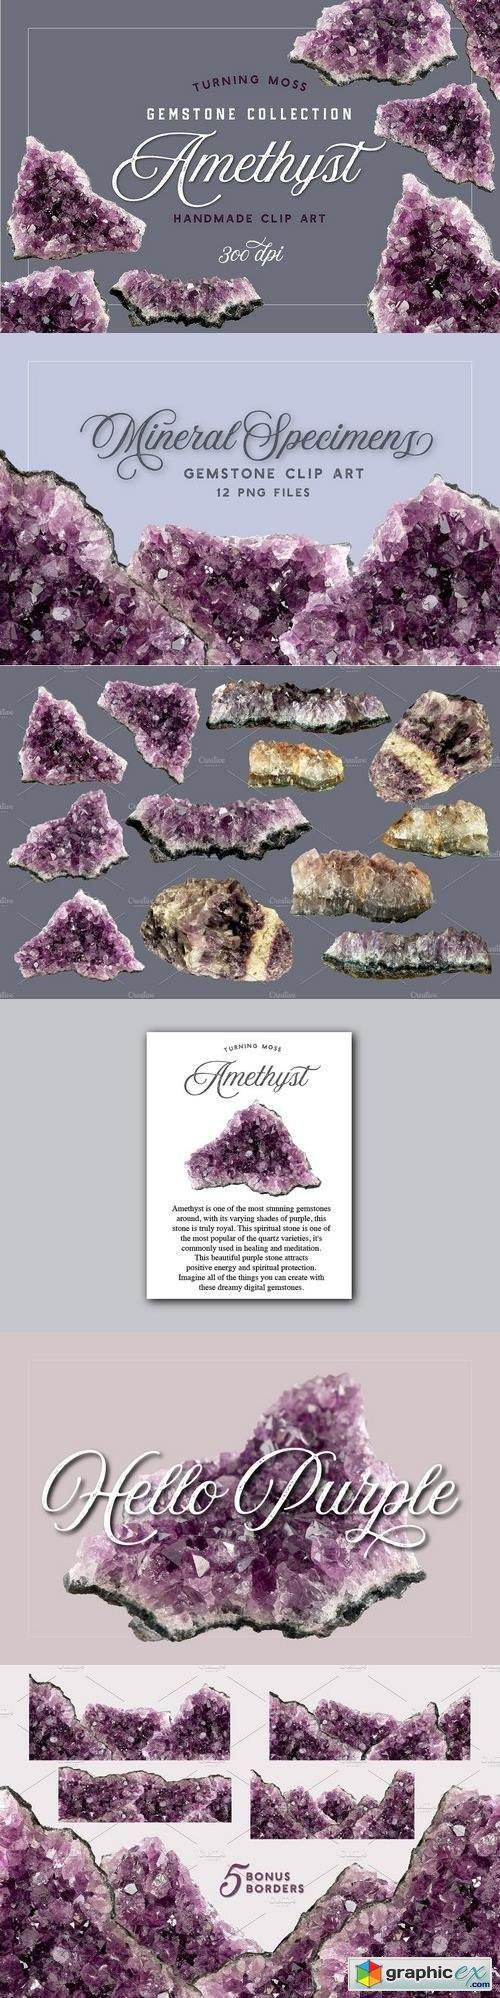 Amethyst - Gemstone Specimens